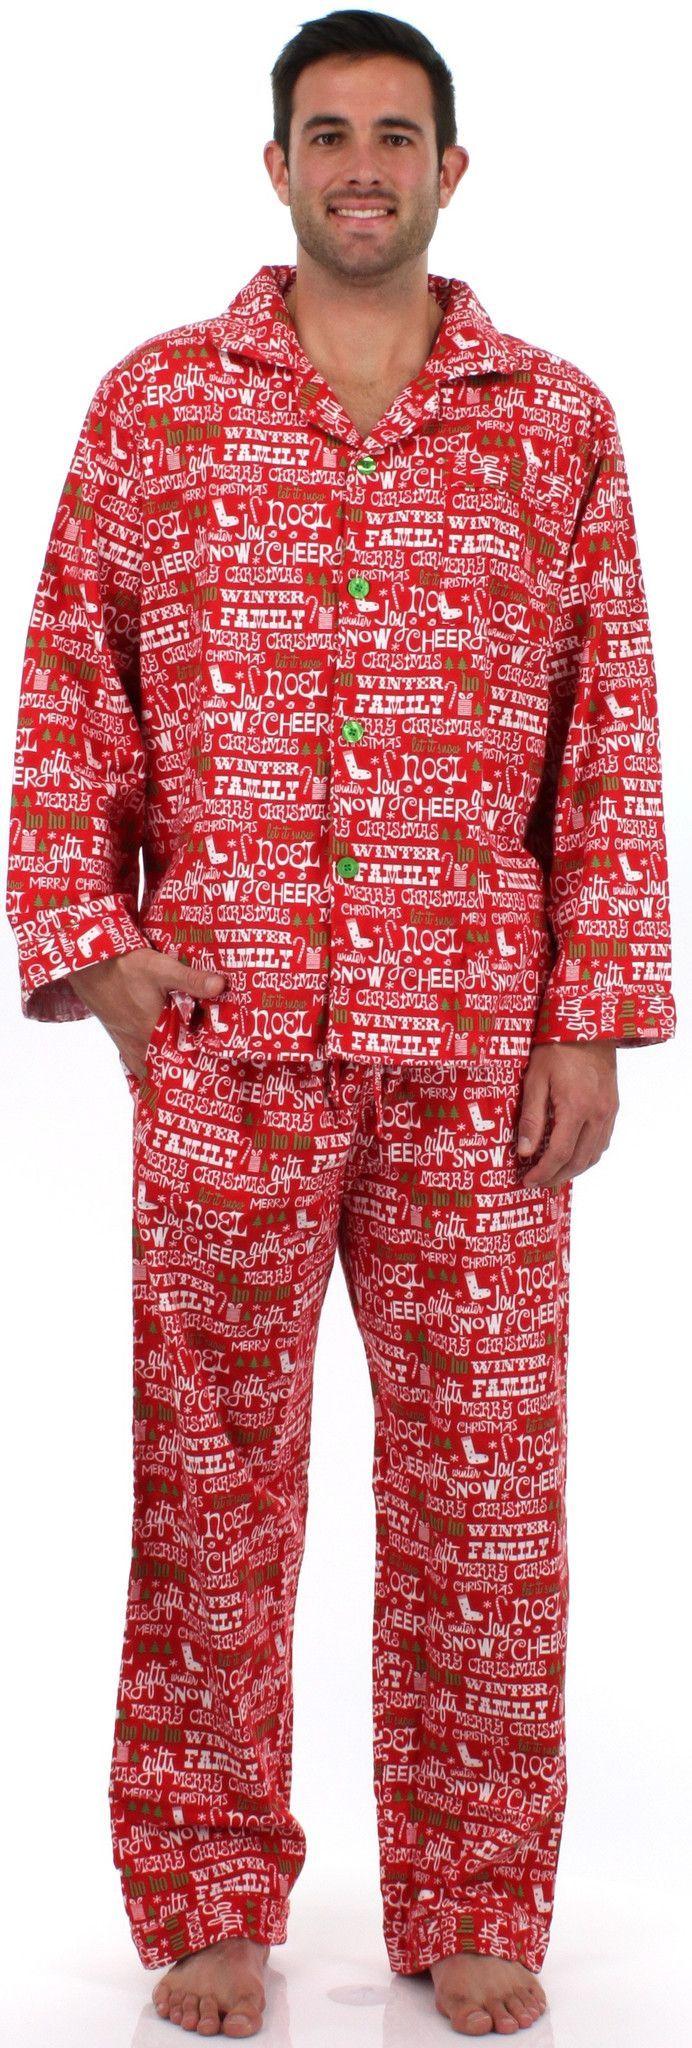 SleepytimePjs Men's Flannel Pajamas